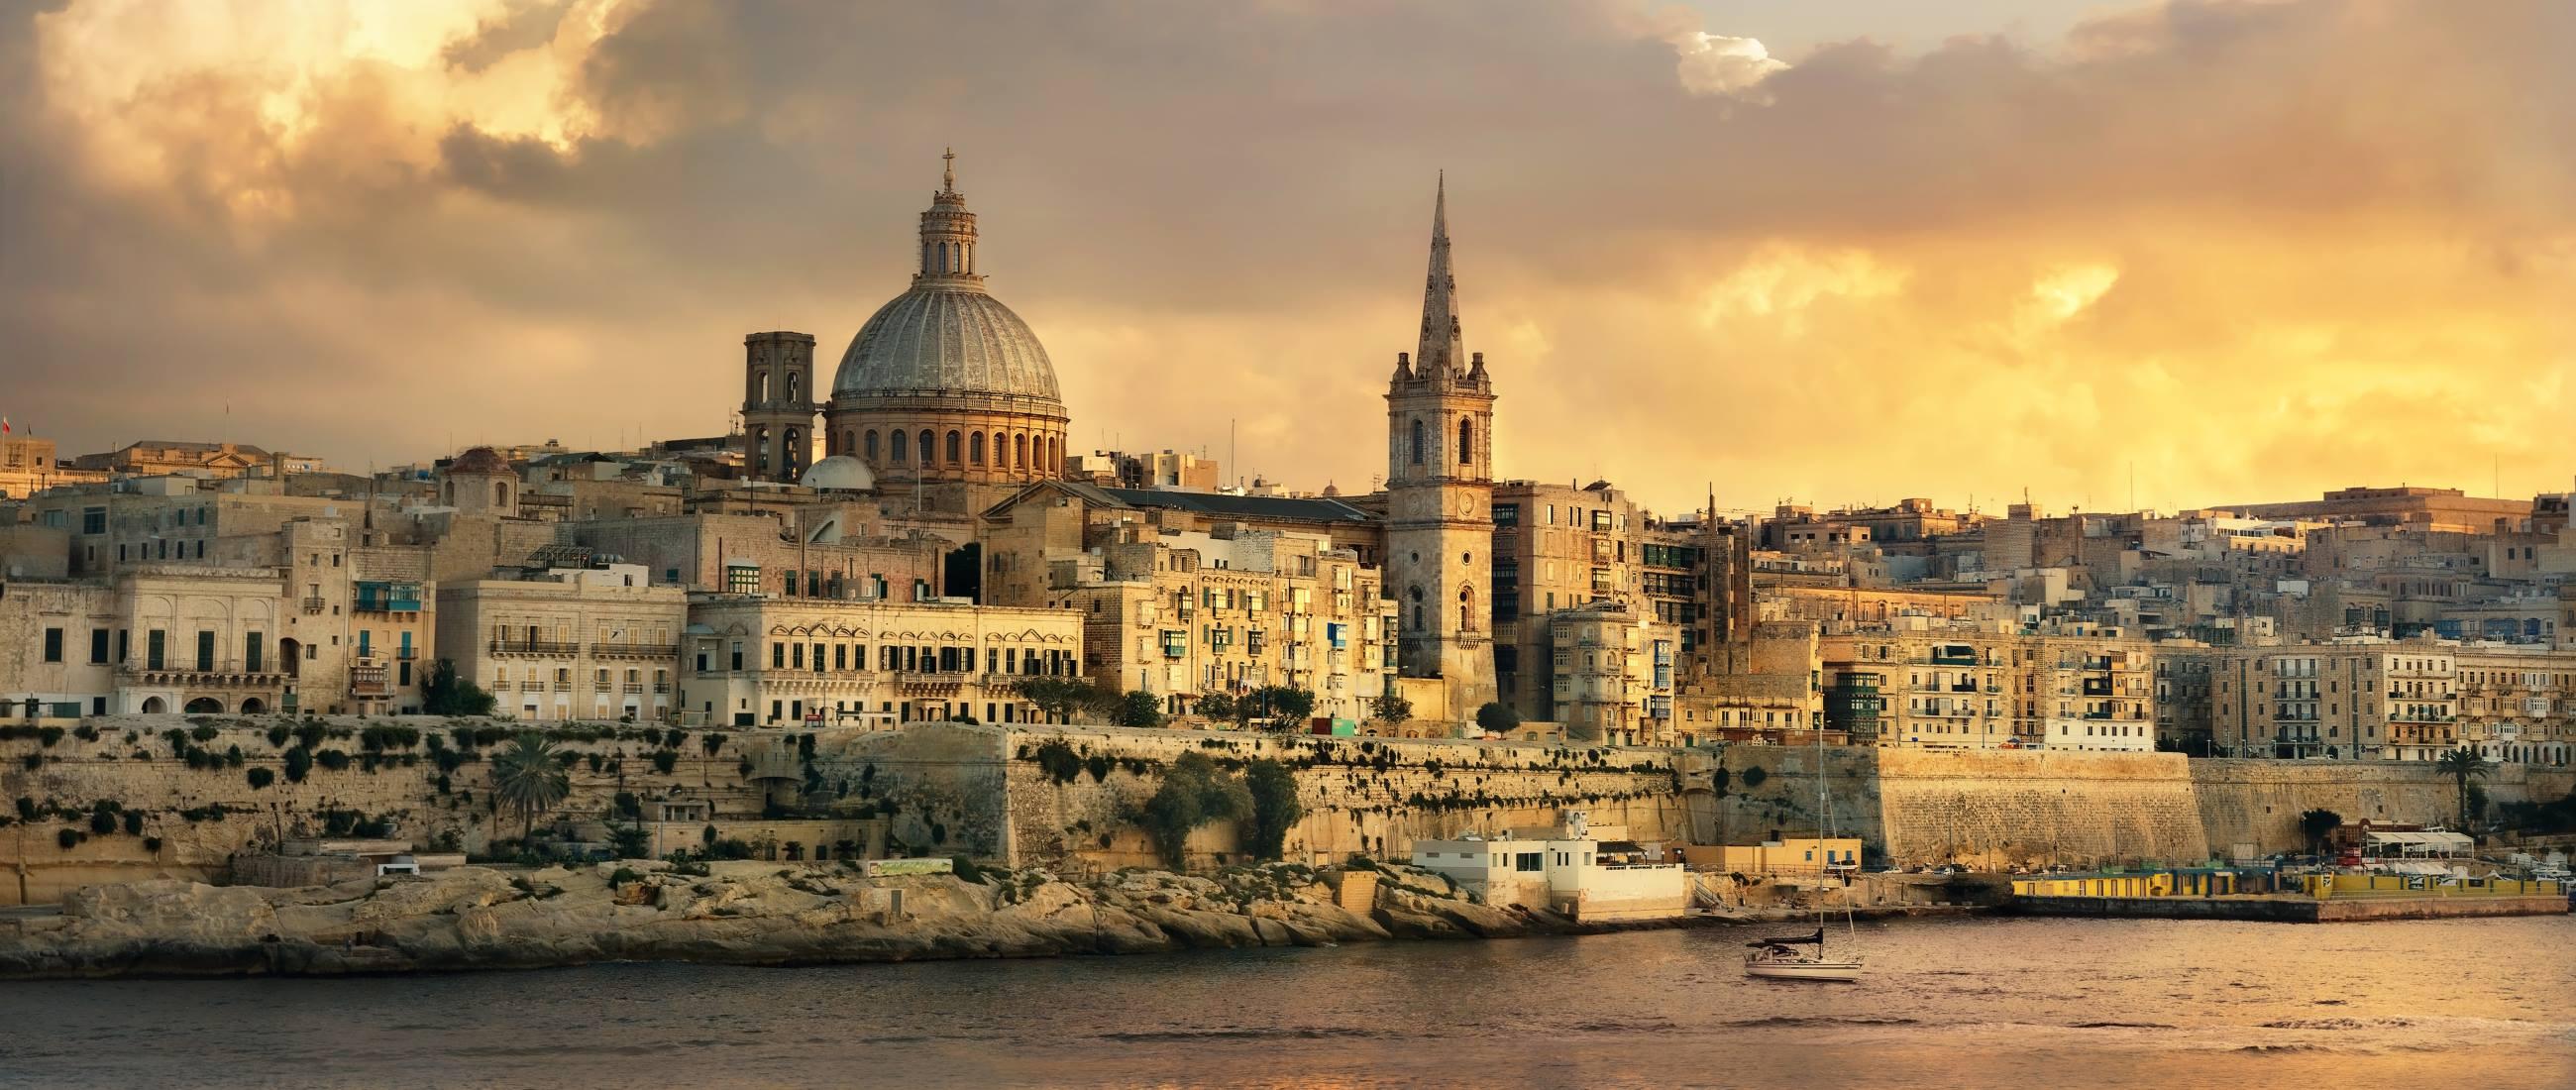 Malta-The-Ideal-Winter-Sun-Location